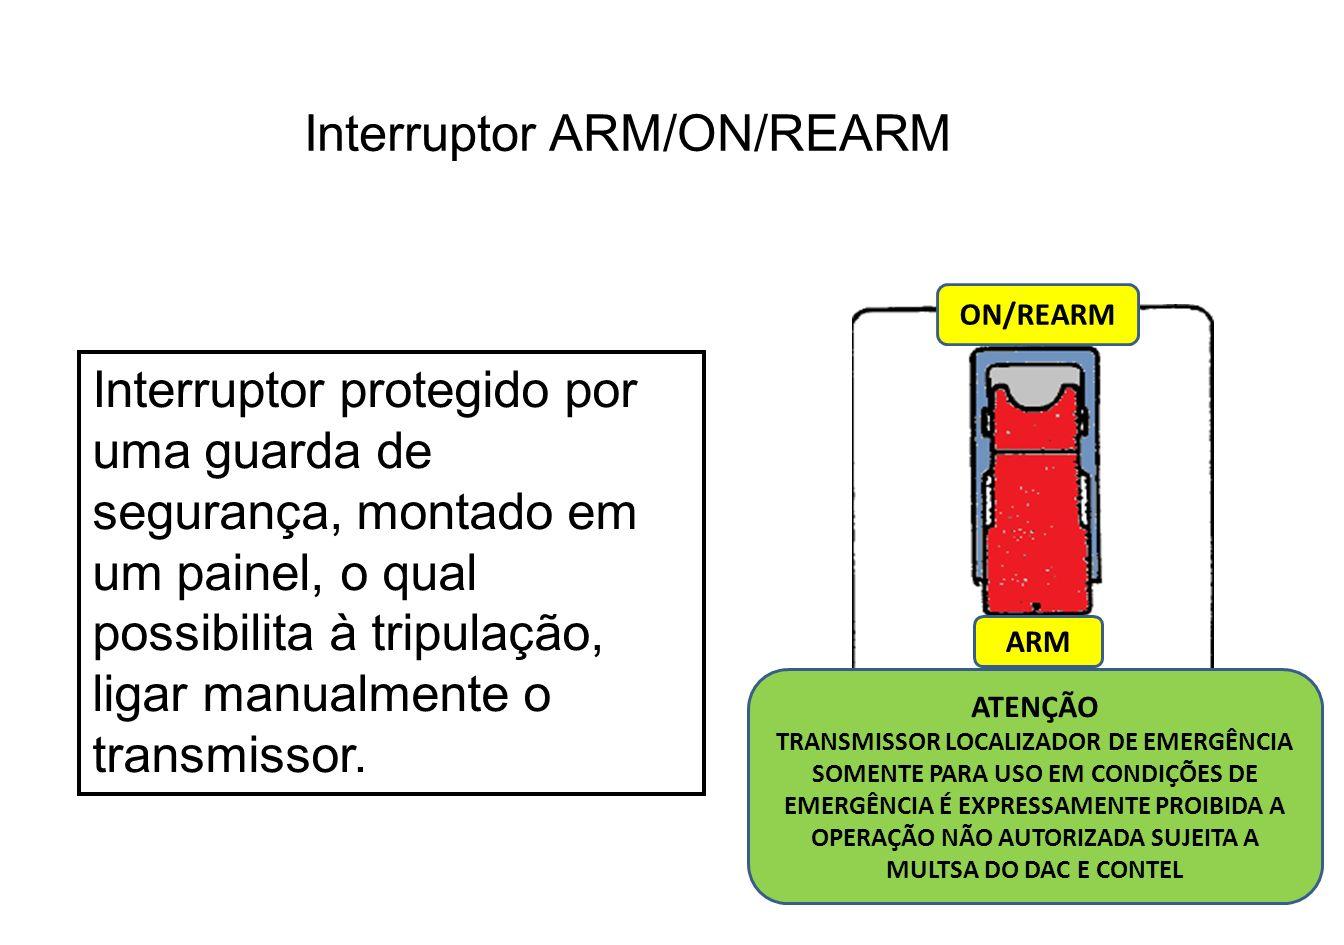 Interruptor ARM/ON/REARM